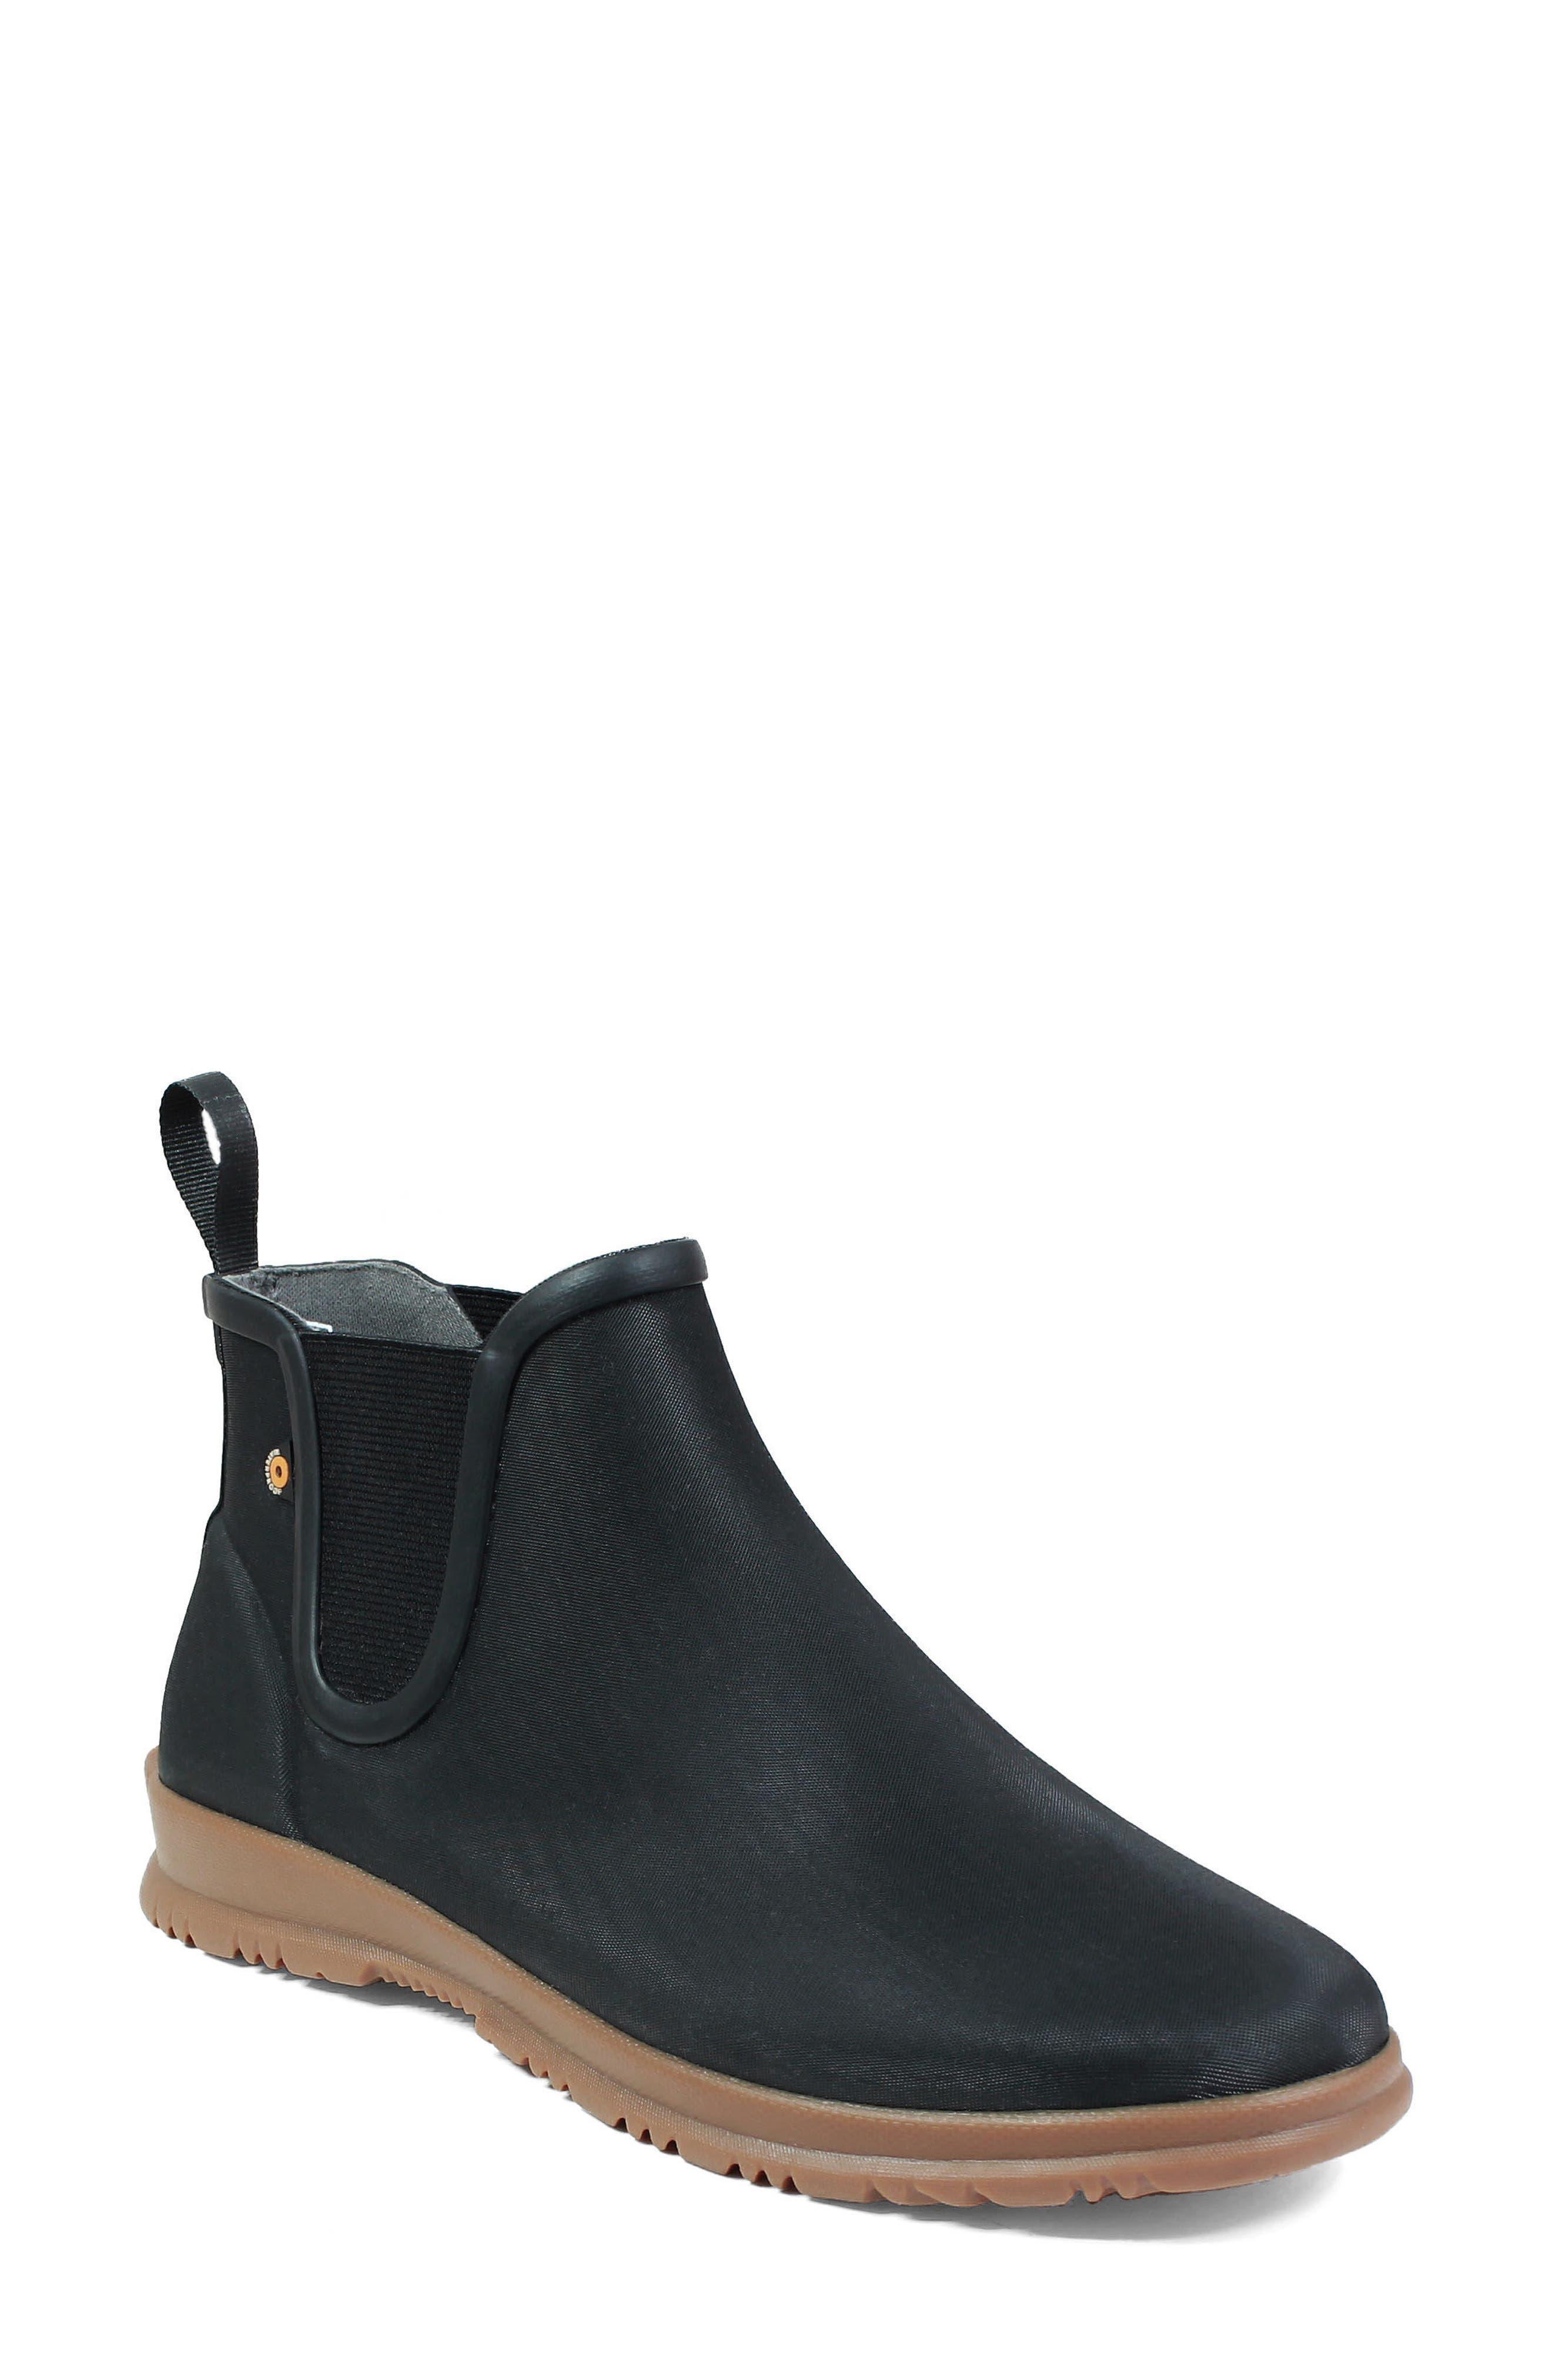 Sweetpea Rain Boot